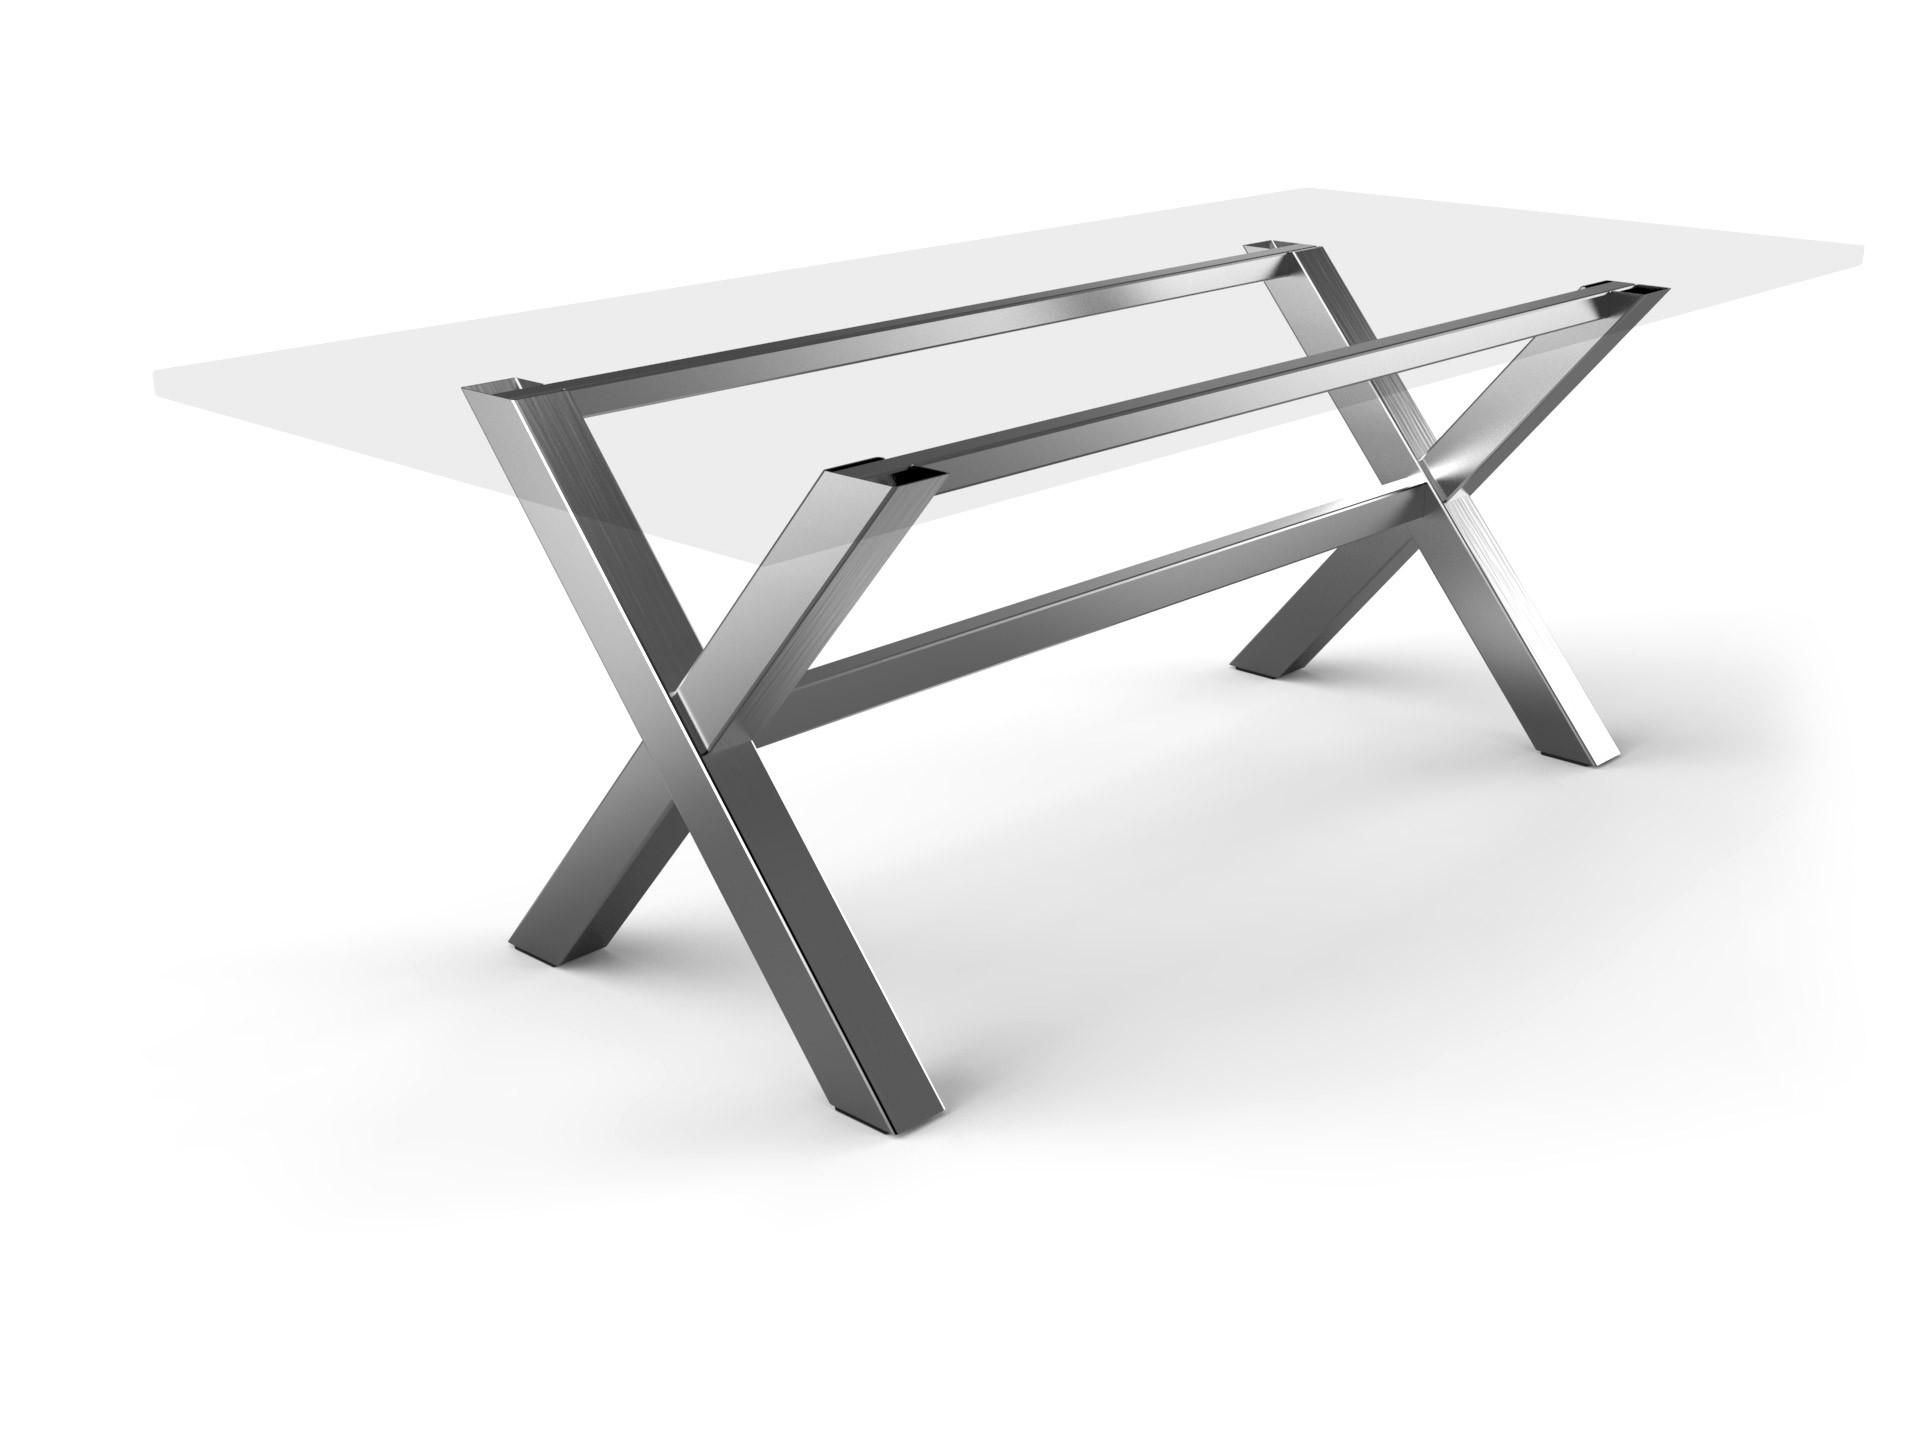 Tischgestell Kreuzfuß Edelstahl